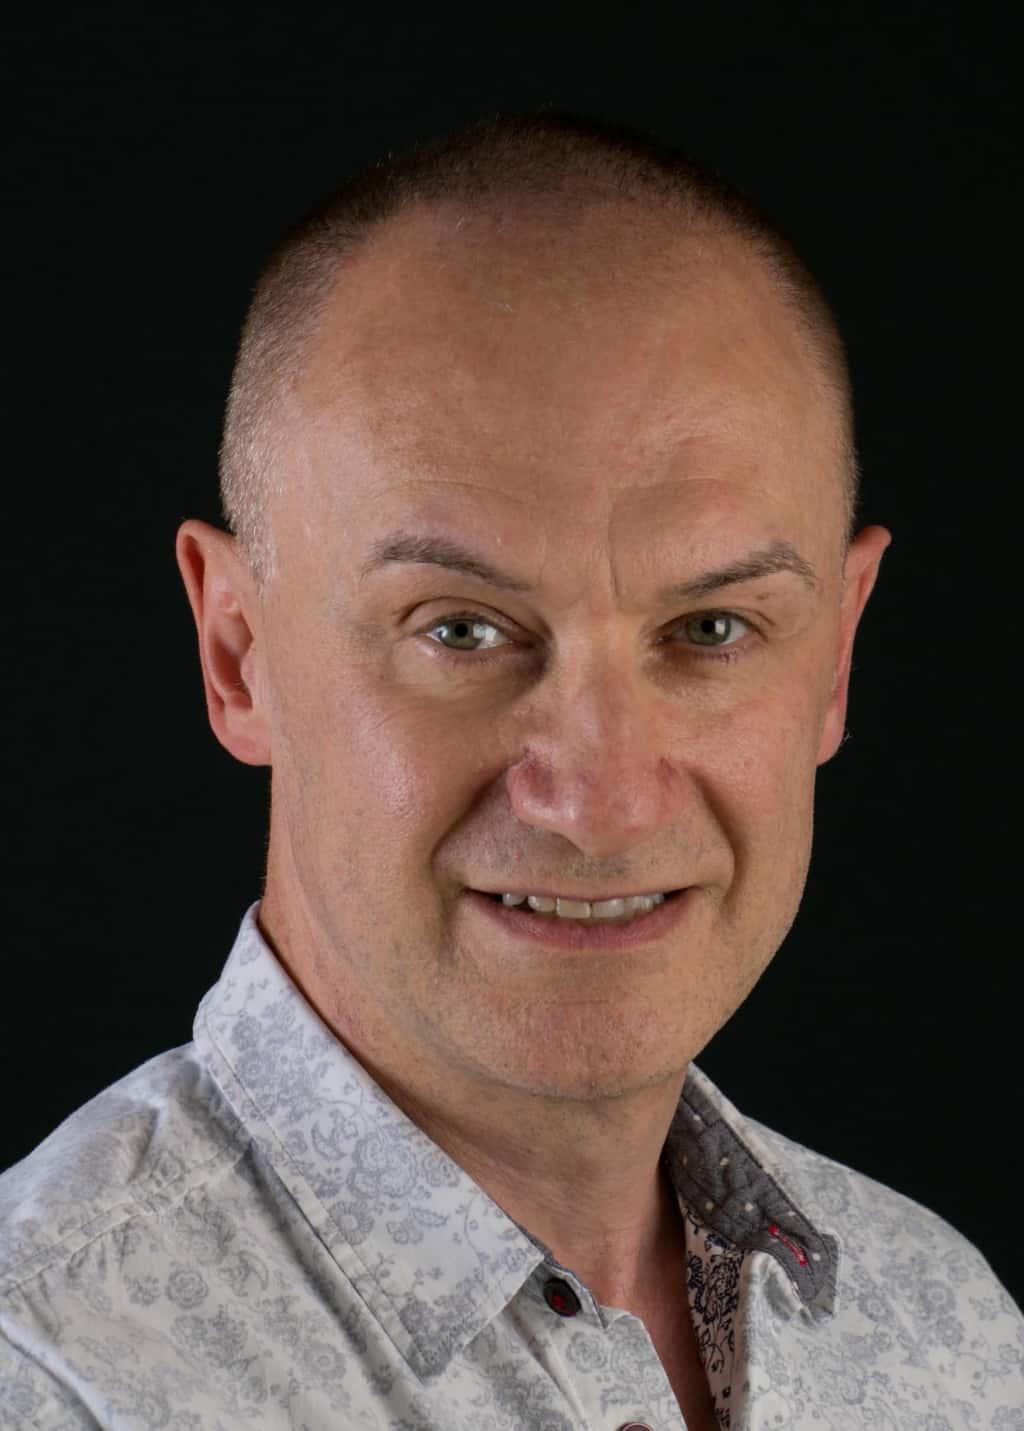 Dr Simon Agabeg